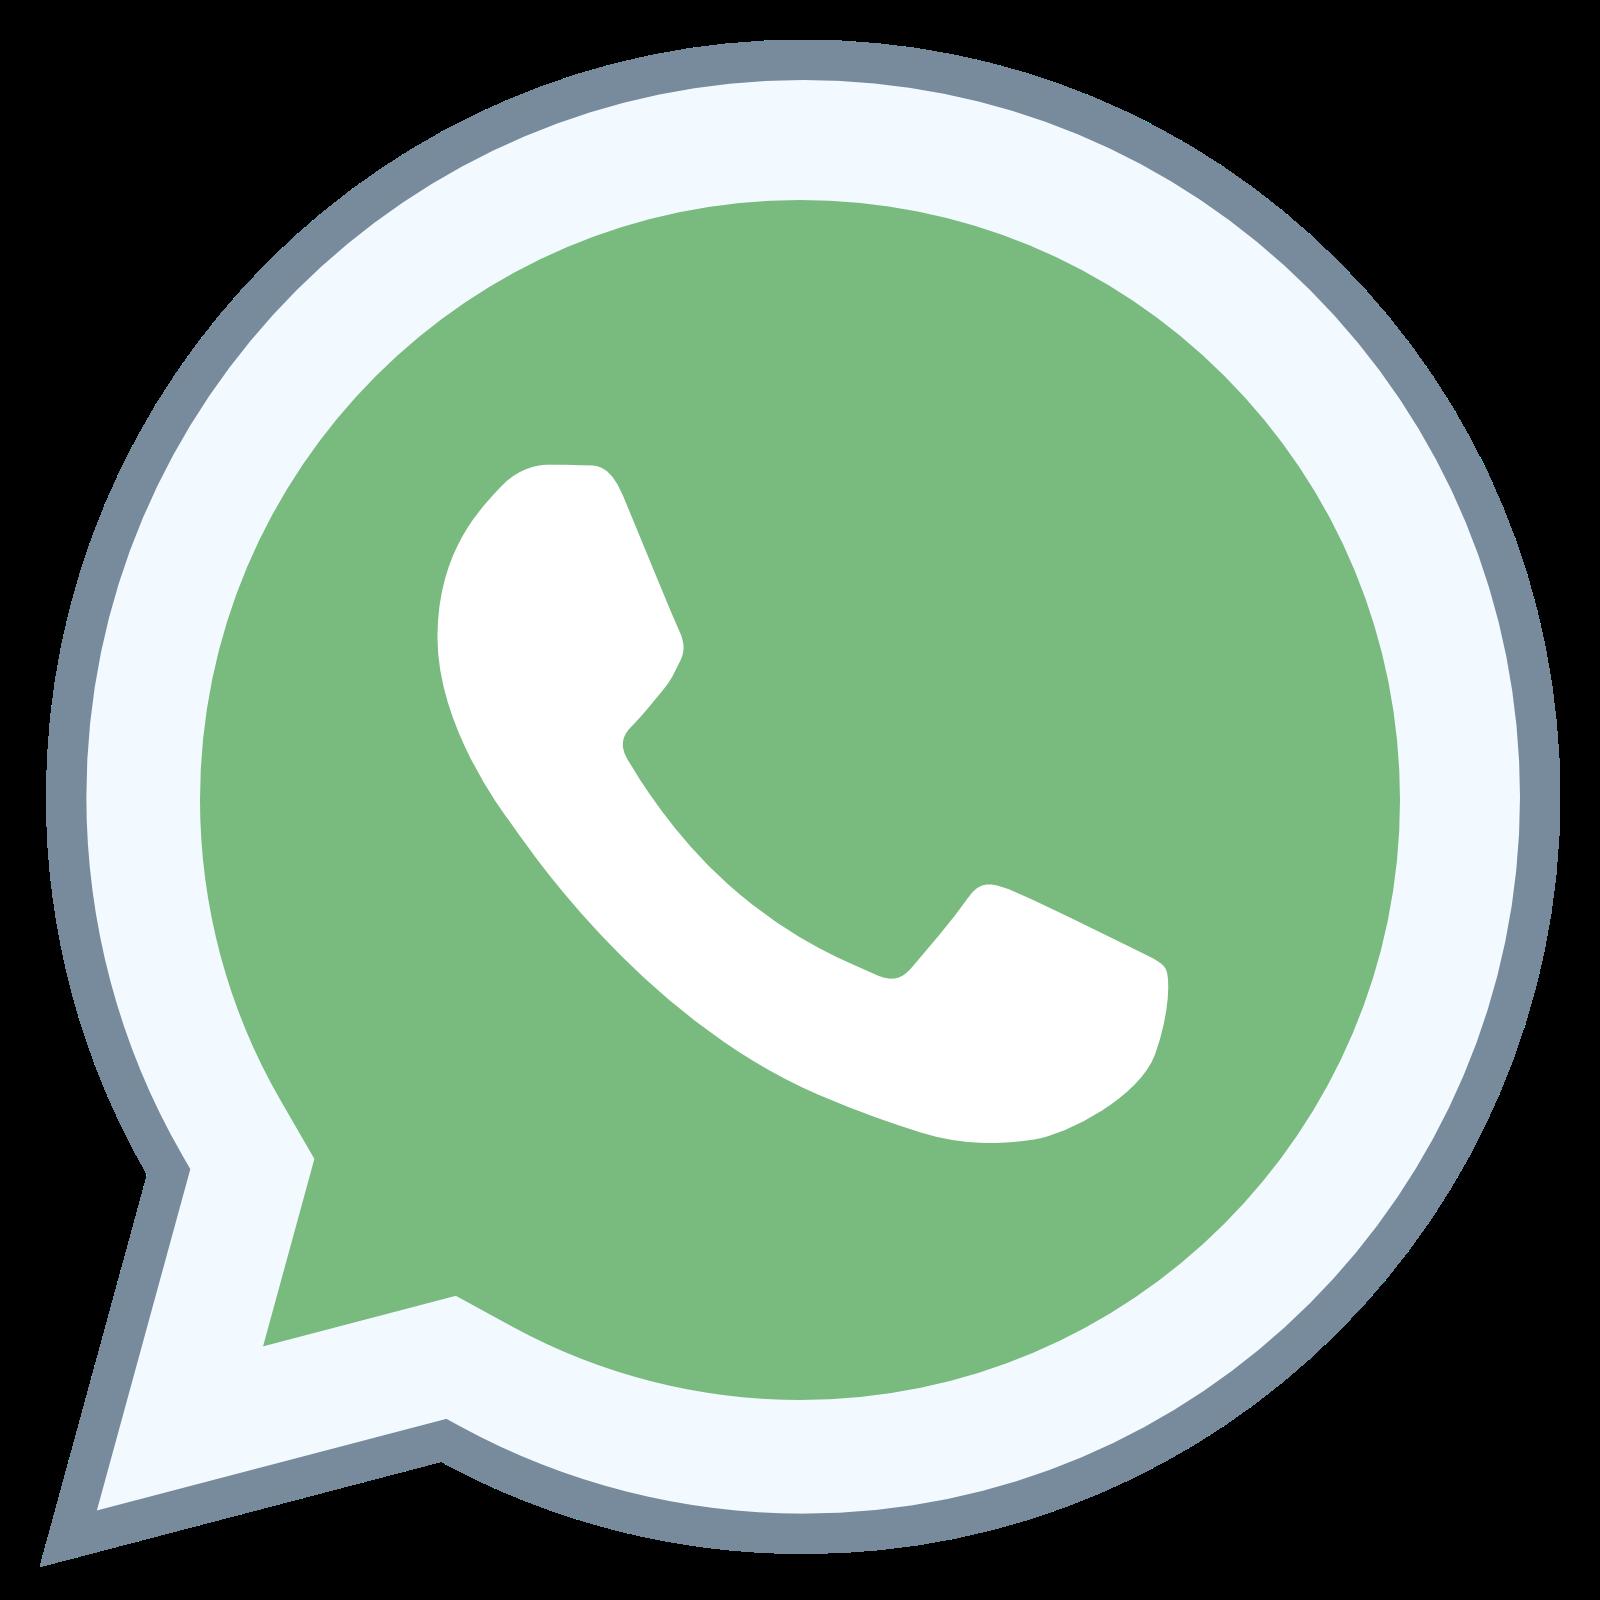 Download Gb Whatsapp Omar